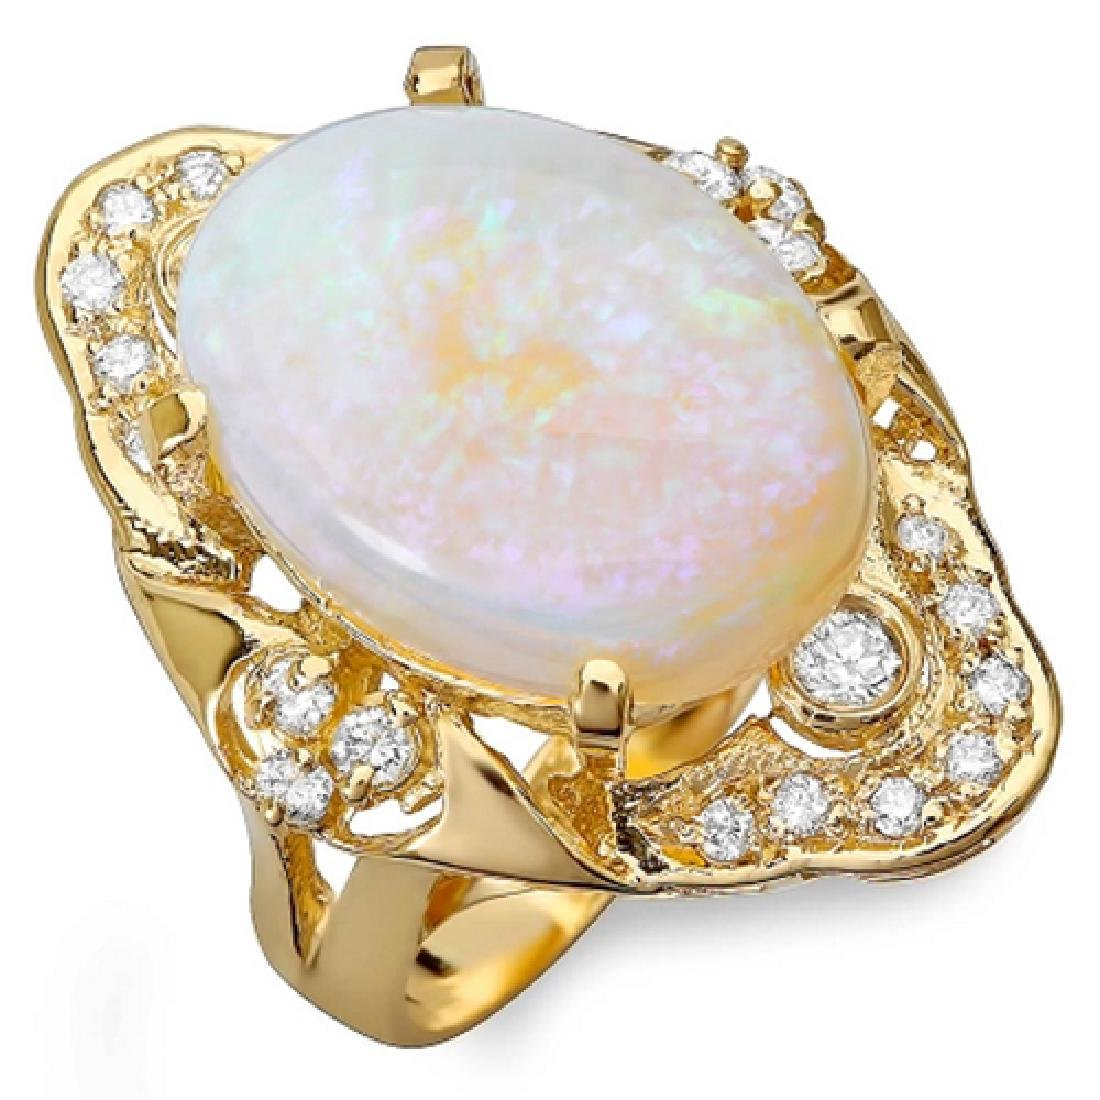 9.85 Carat Natural Opal 18K Solid Yellow Gold Diamond - 2